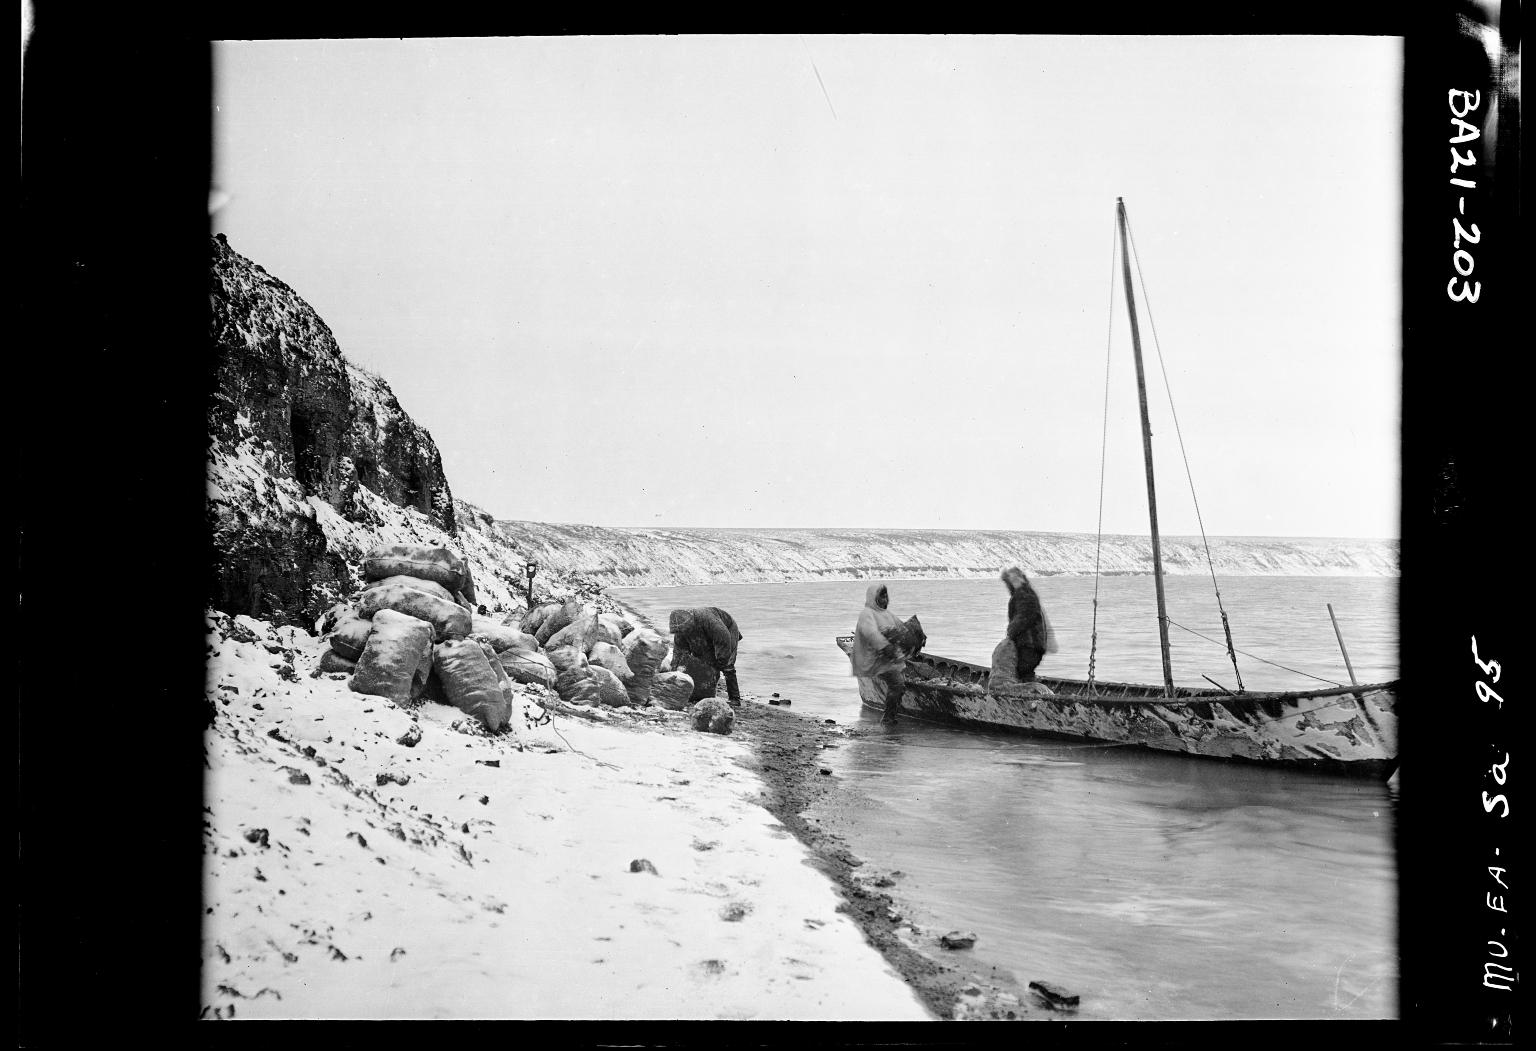 Eskimo men loading coal